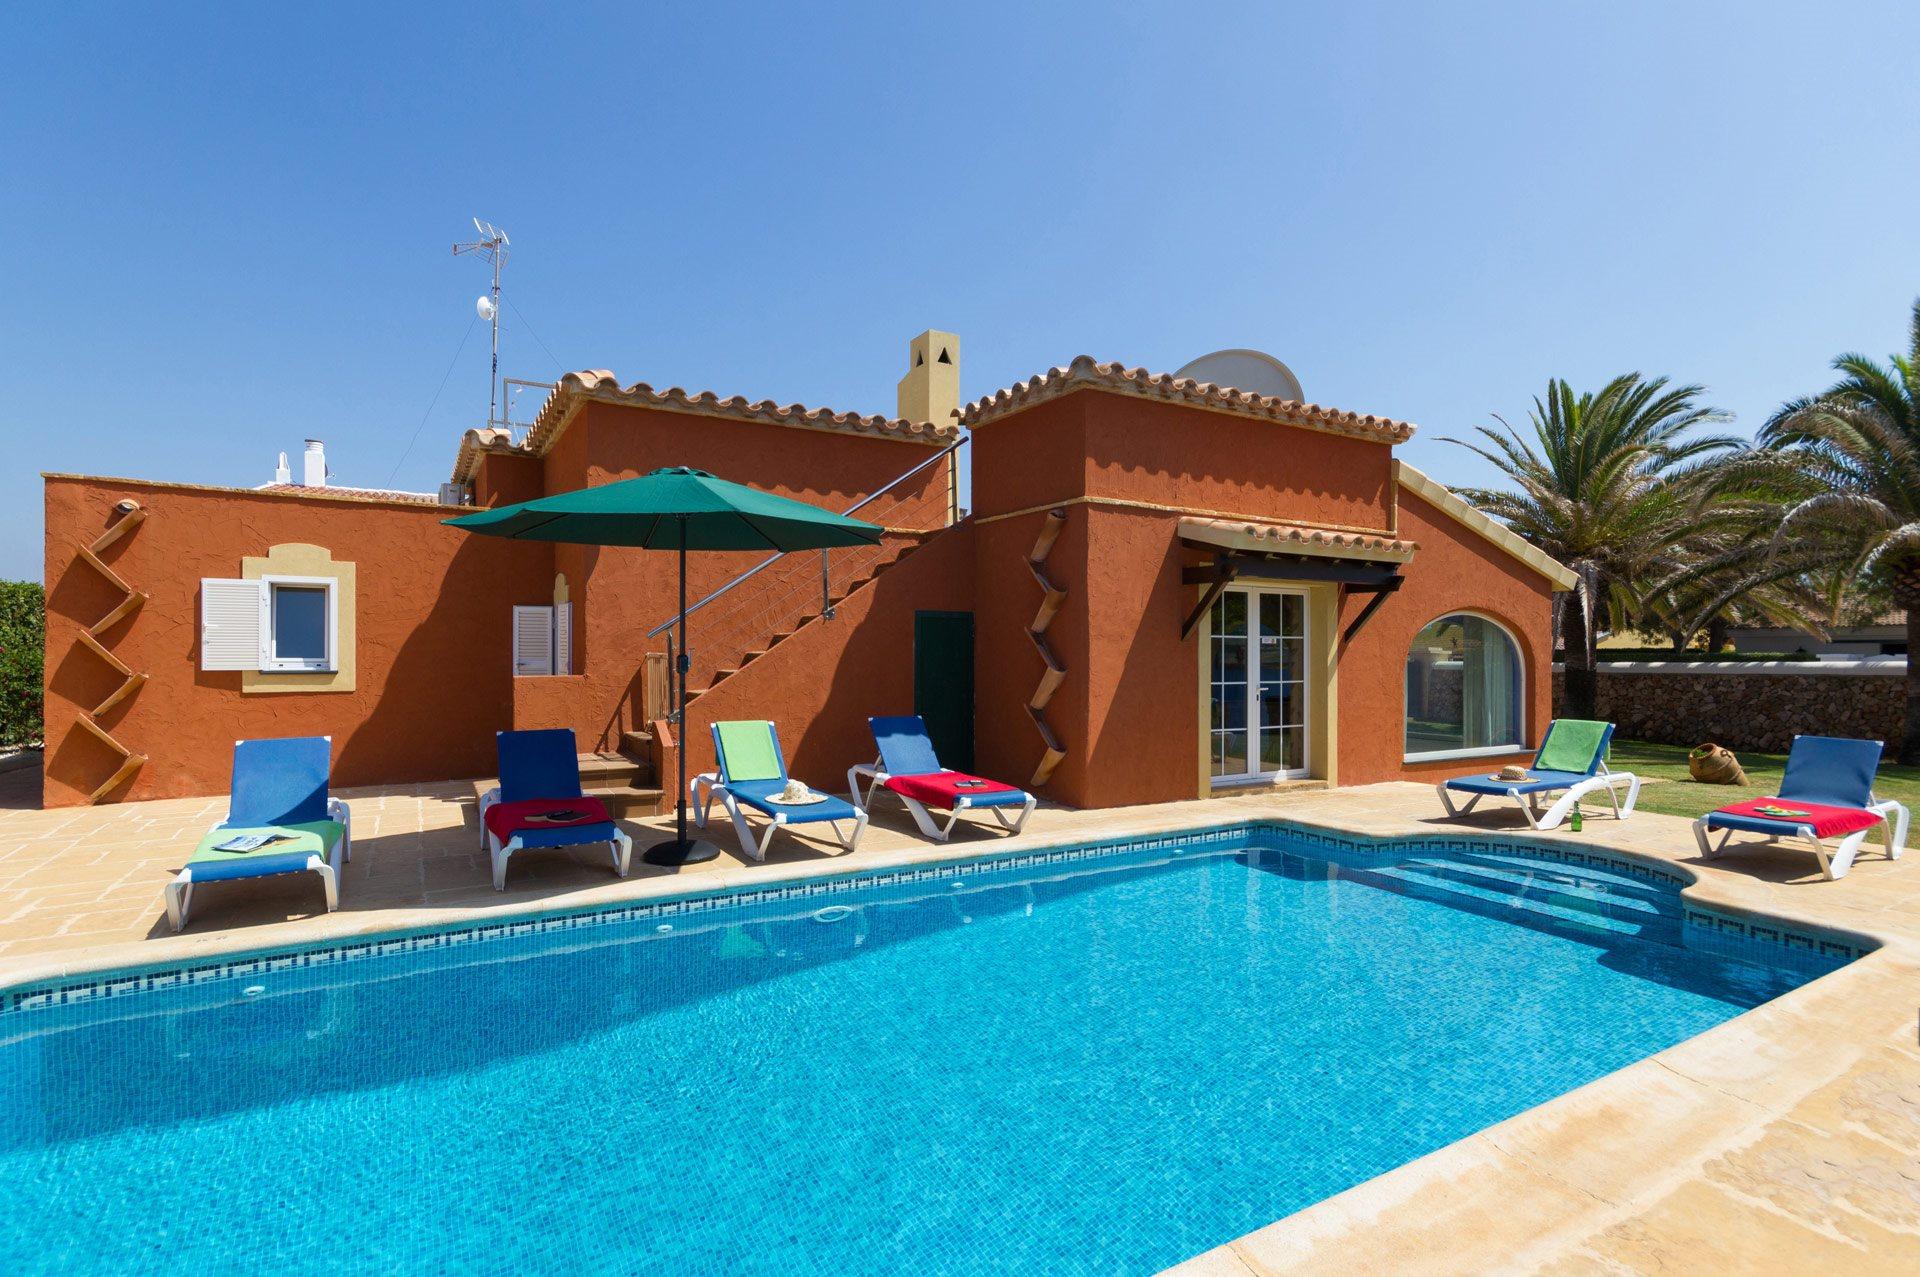 Villa Hegoalde, Calan Blanes, Menorca, Spain